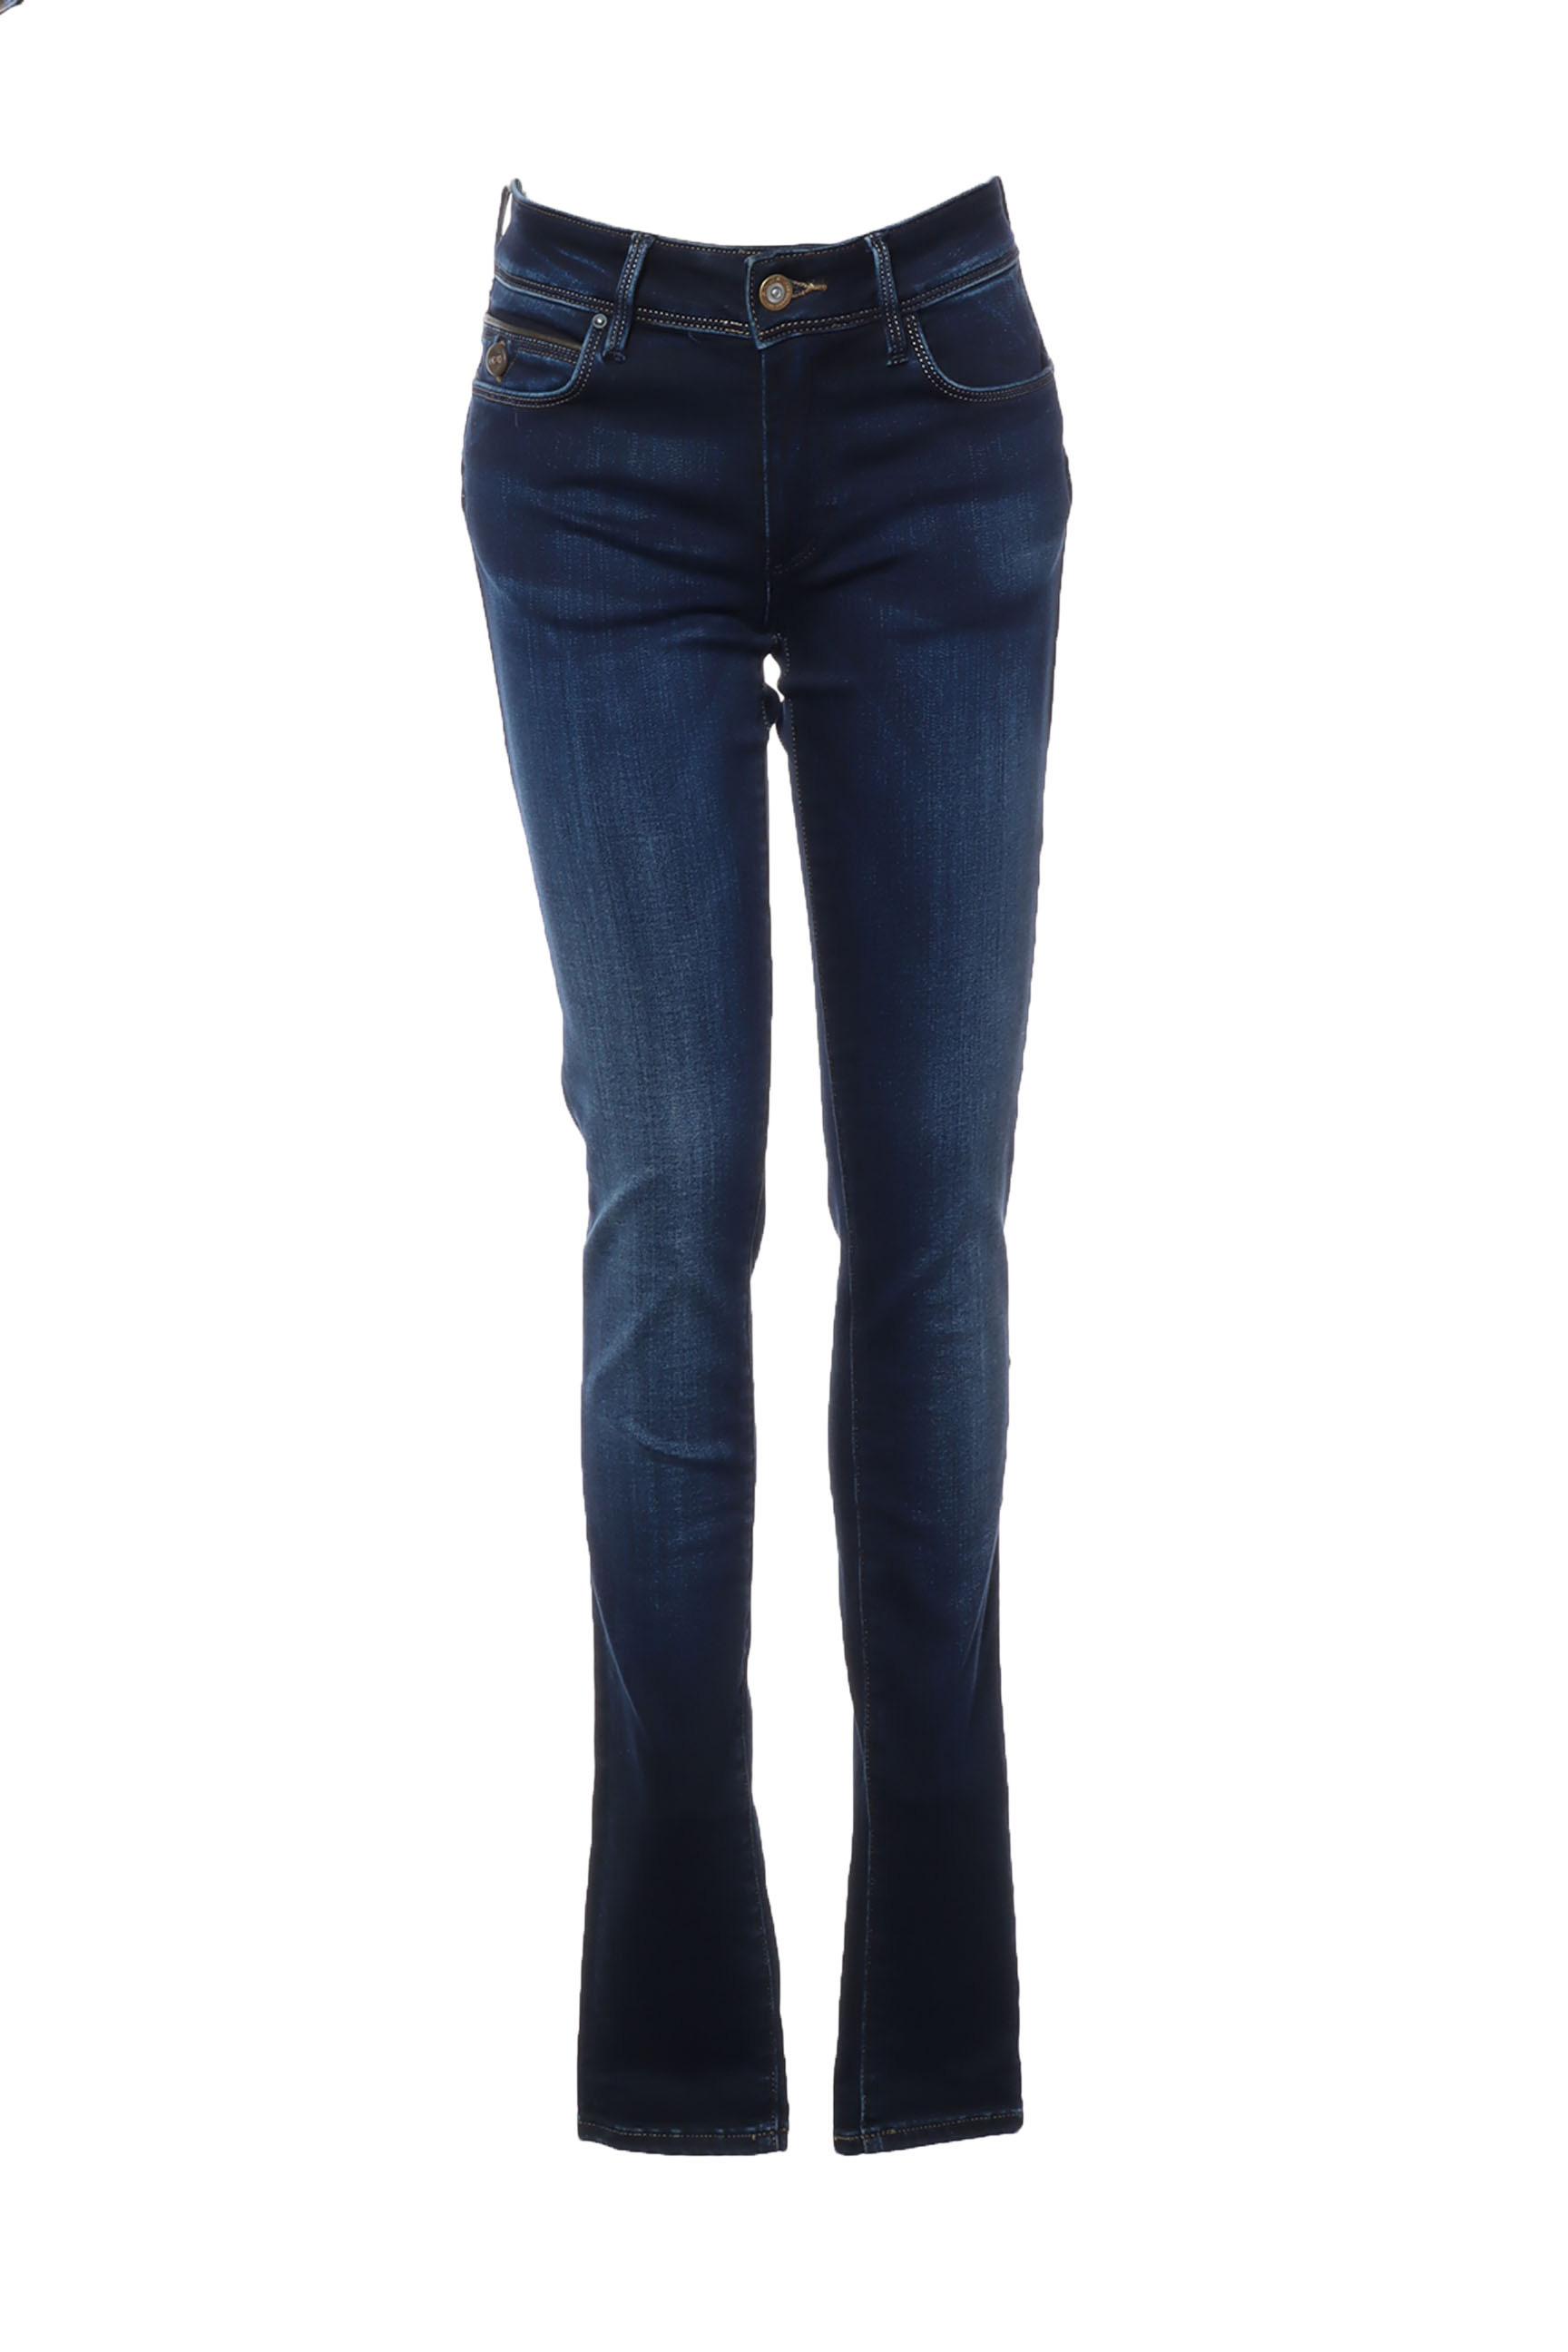 Jeans coupe slim femme Salsa bleu taille : W24 L32 49 FR (FR)